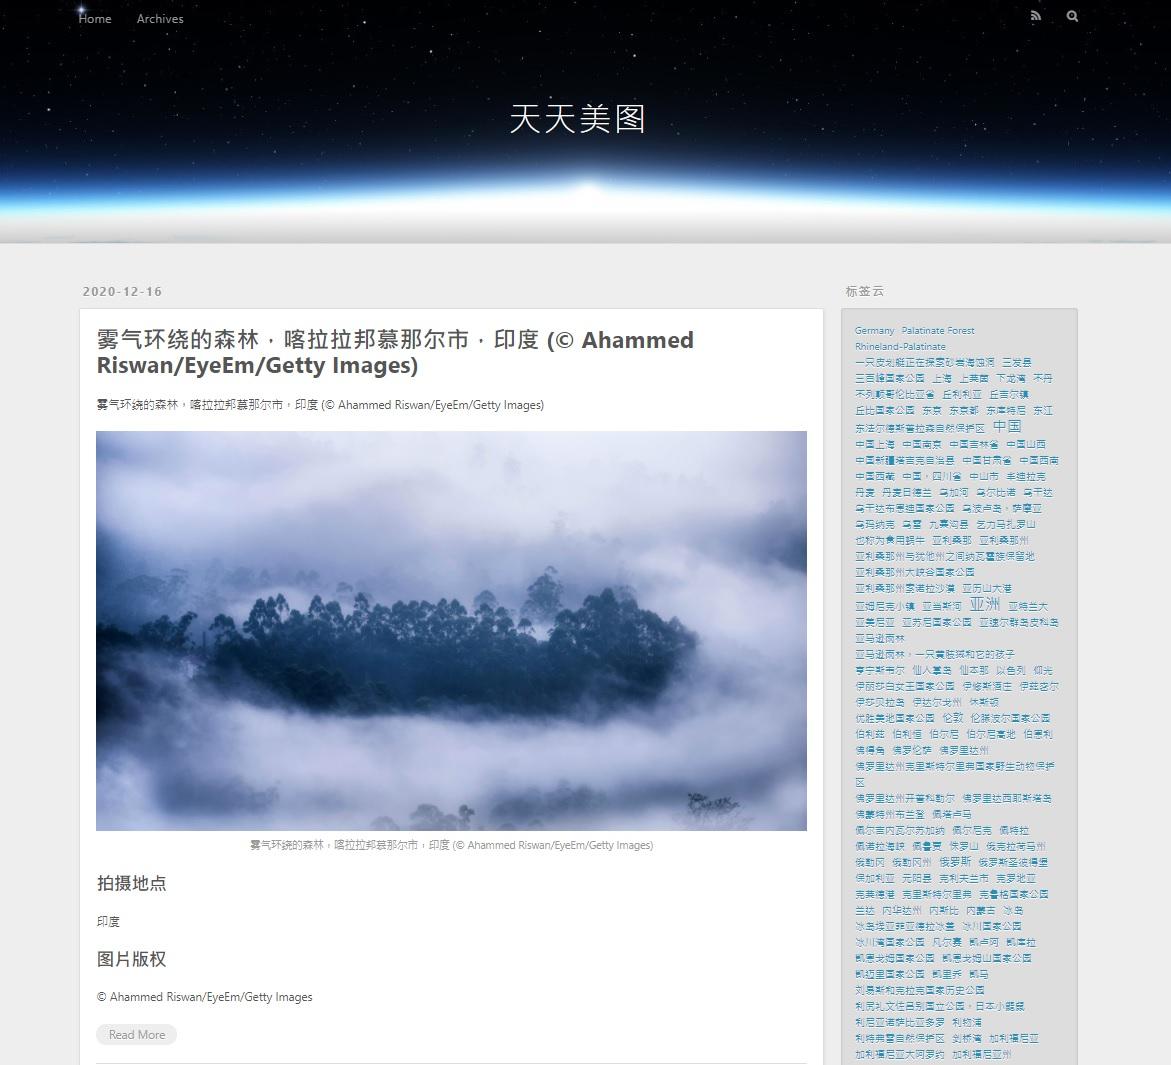 Bing 每天給你一張高畫質的桌面背景圖